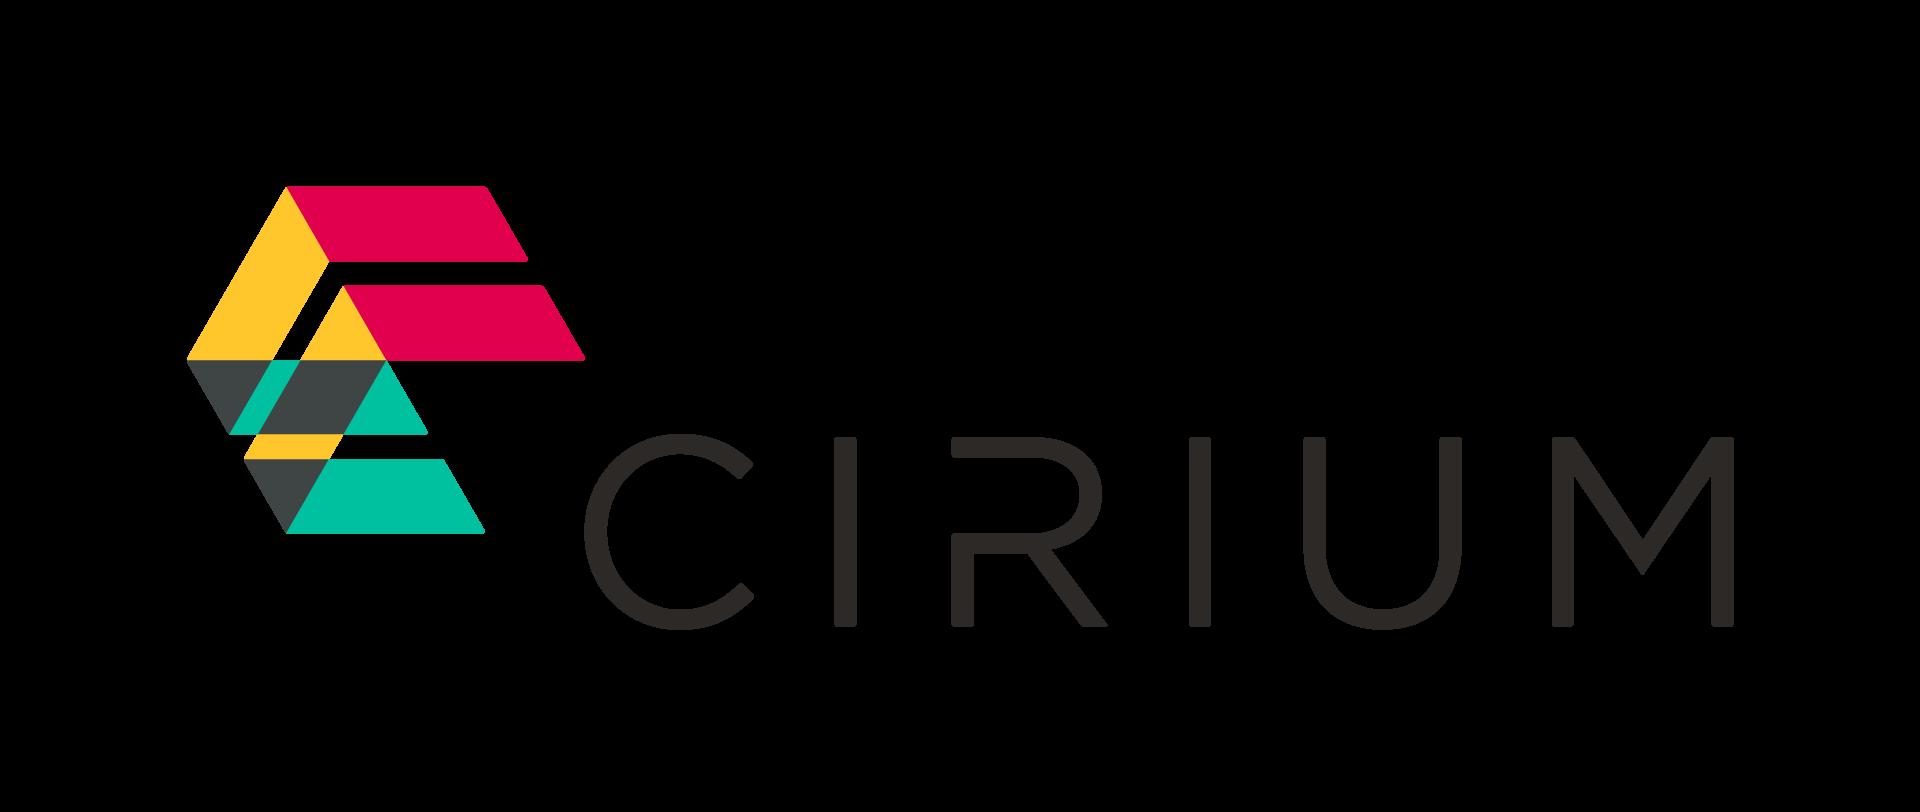 A Smarter Way - Cirium - A Smarter Way